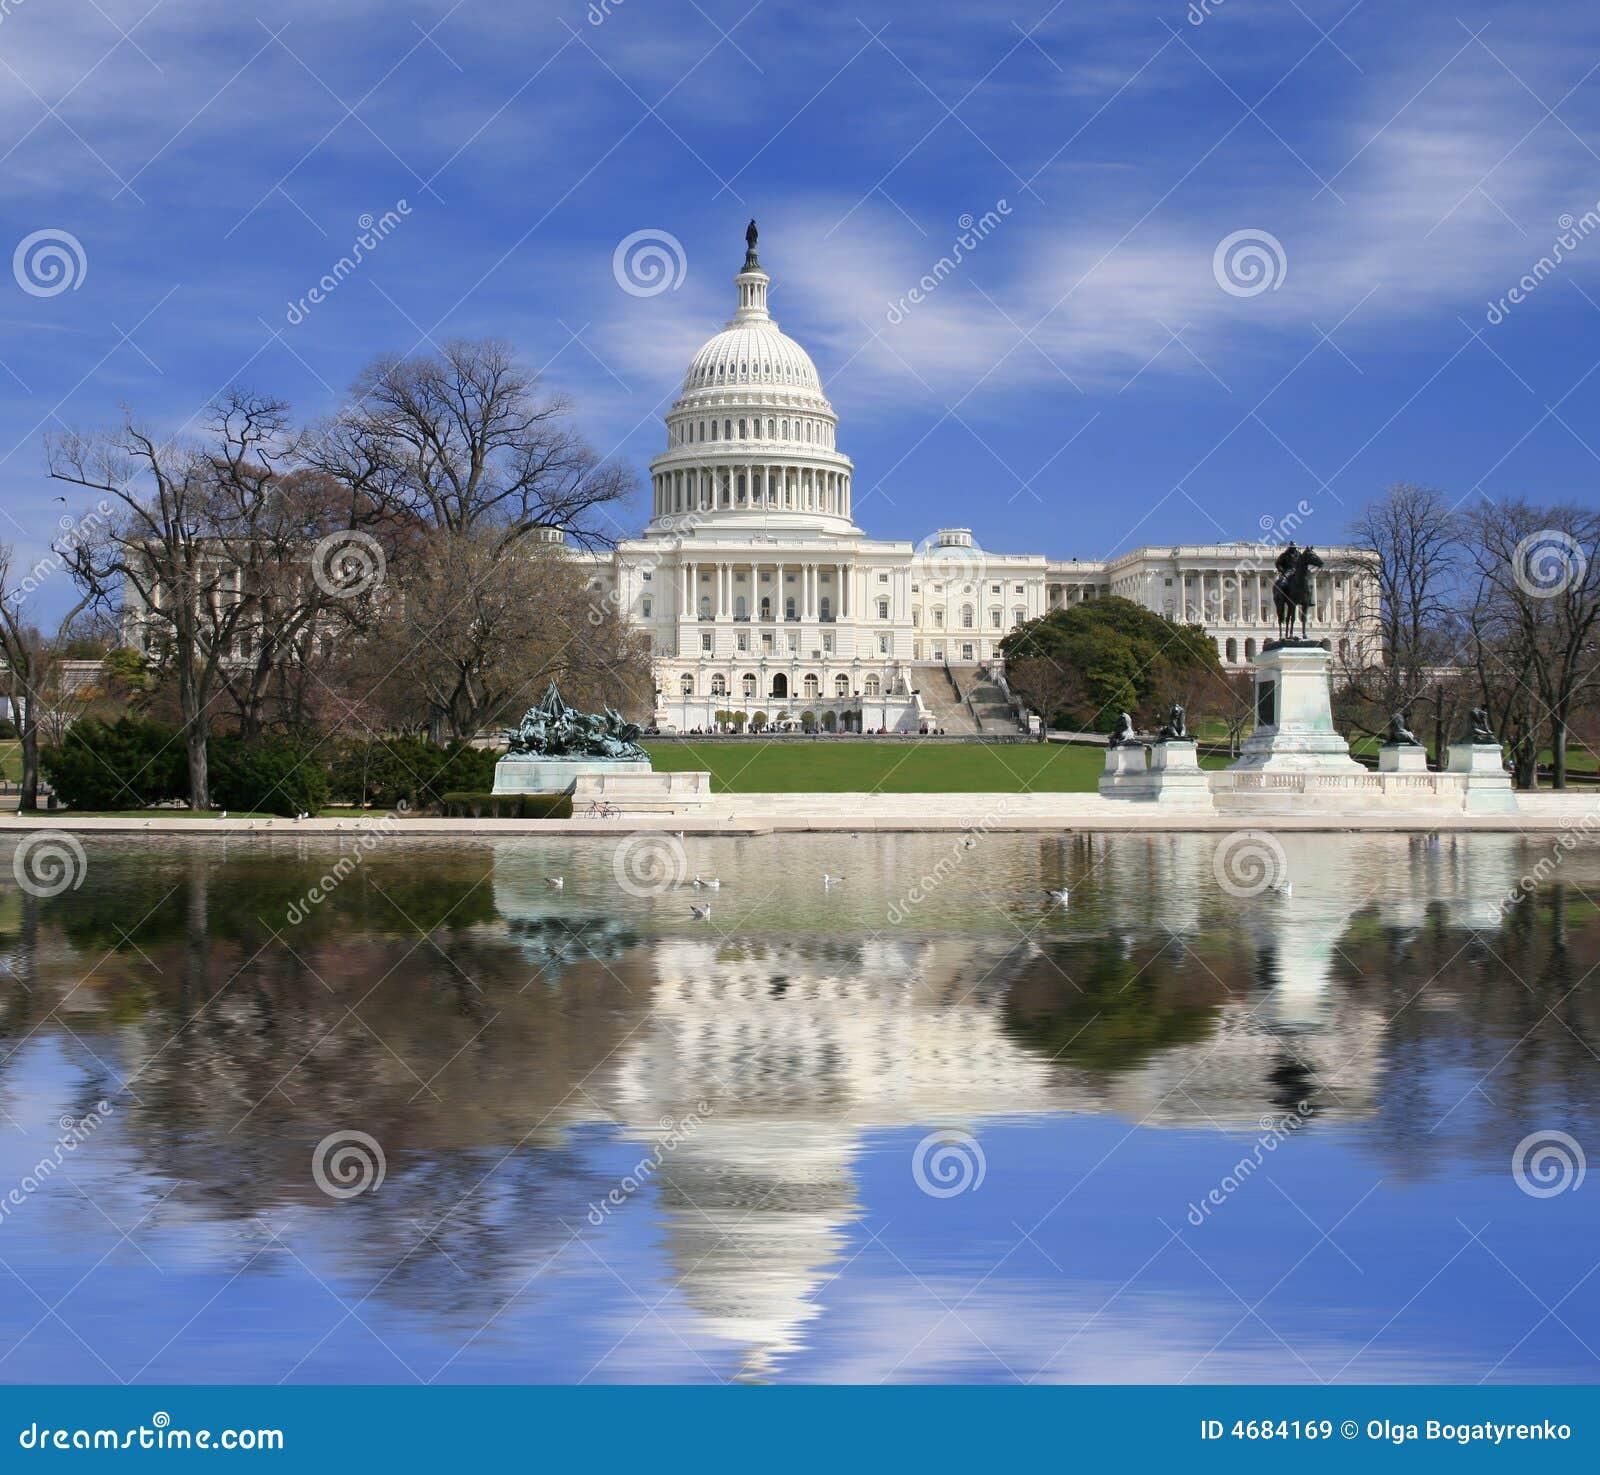 Building capitol dc us washington